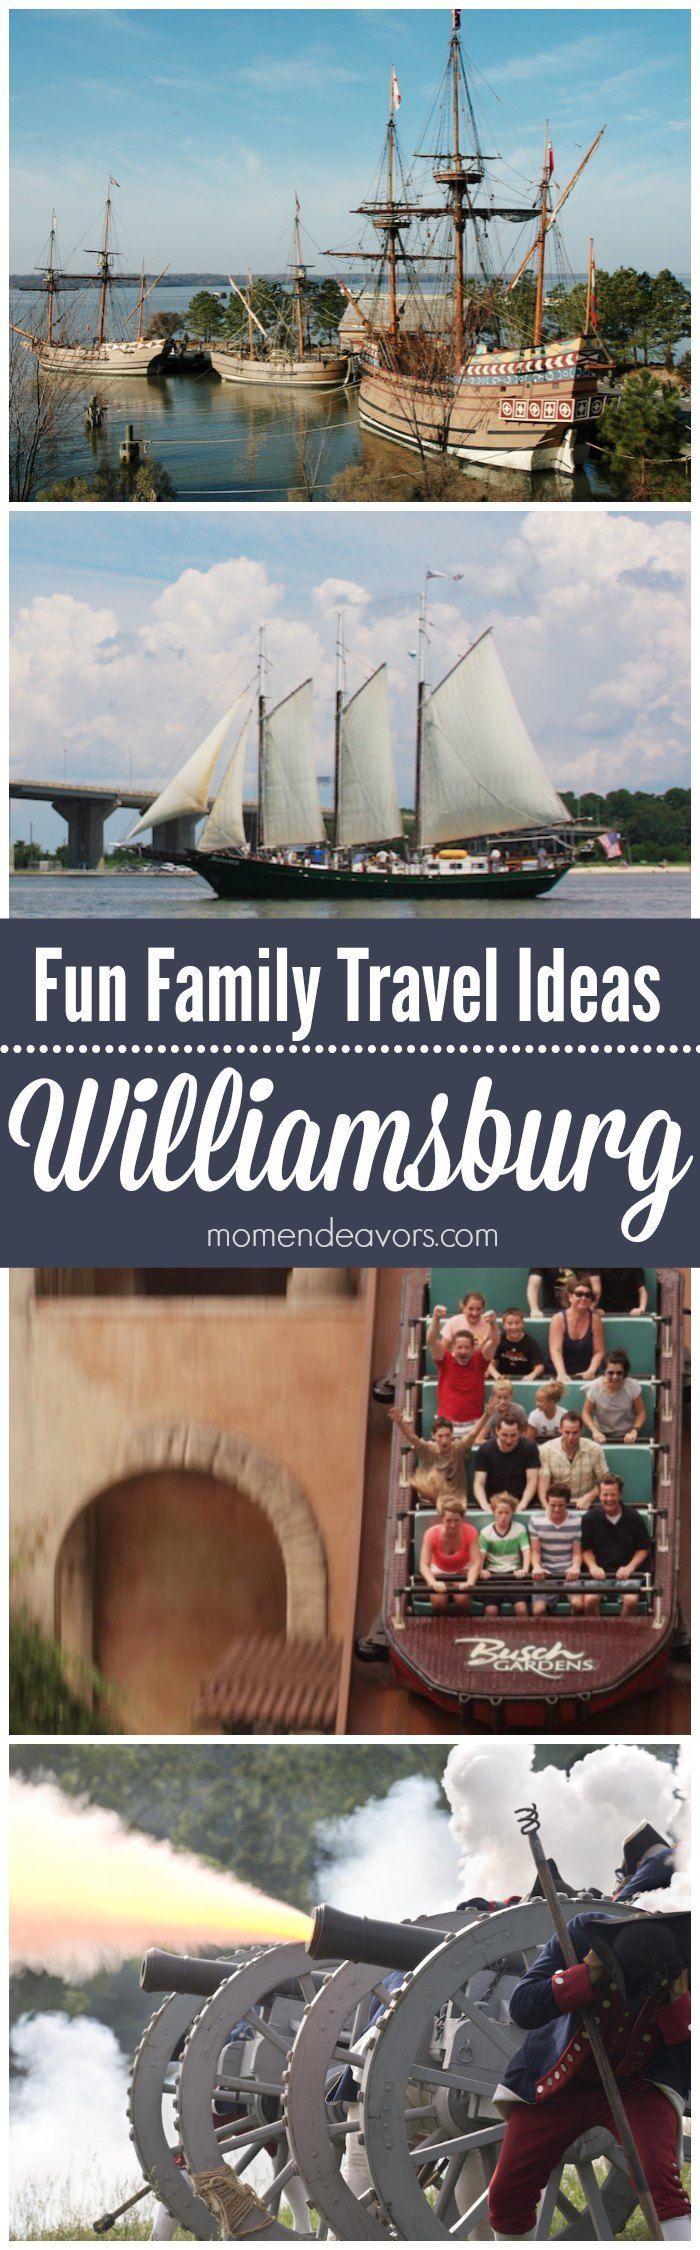 Fun Family Travel Ideas in Williamsburg, Virginia. Sponsored by Visit Williamsburg.